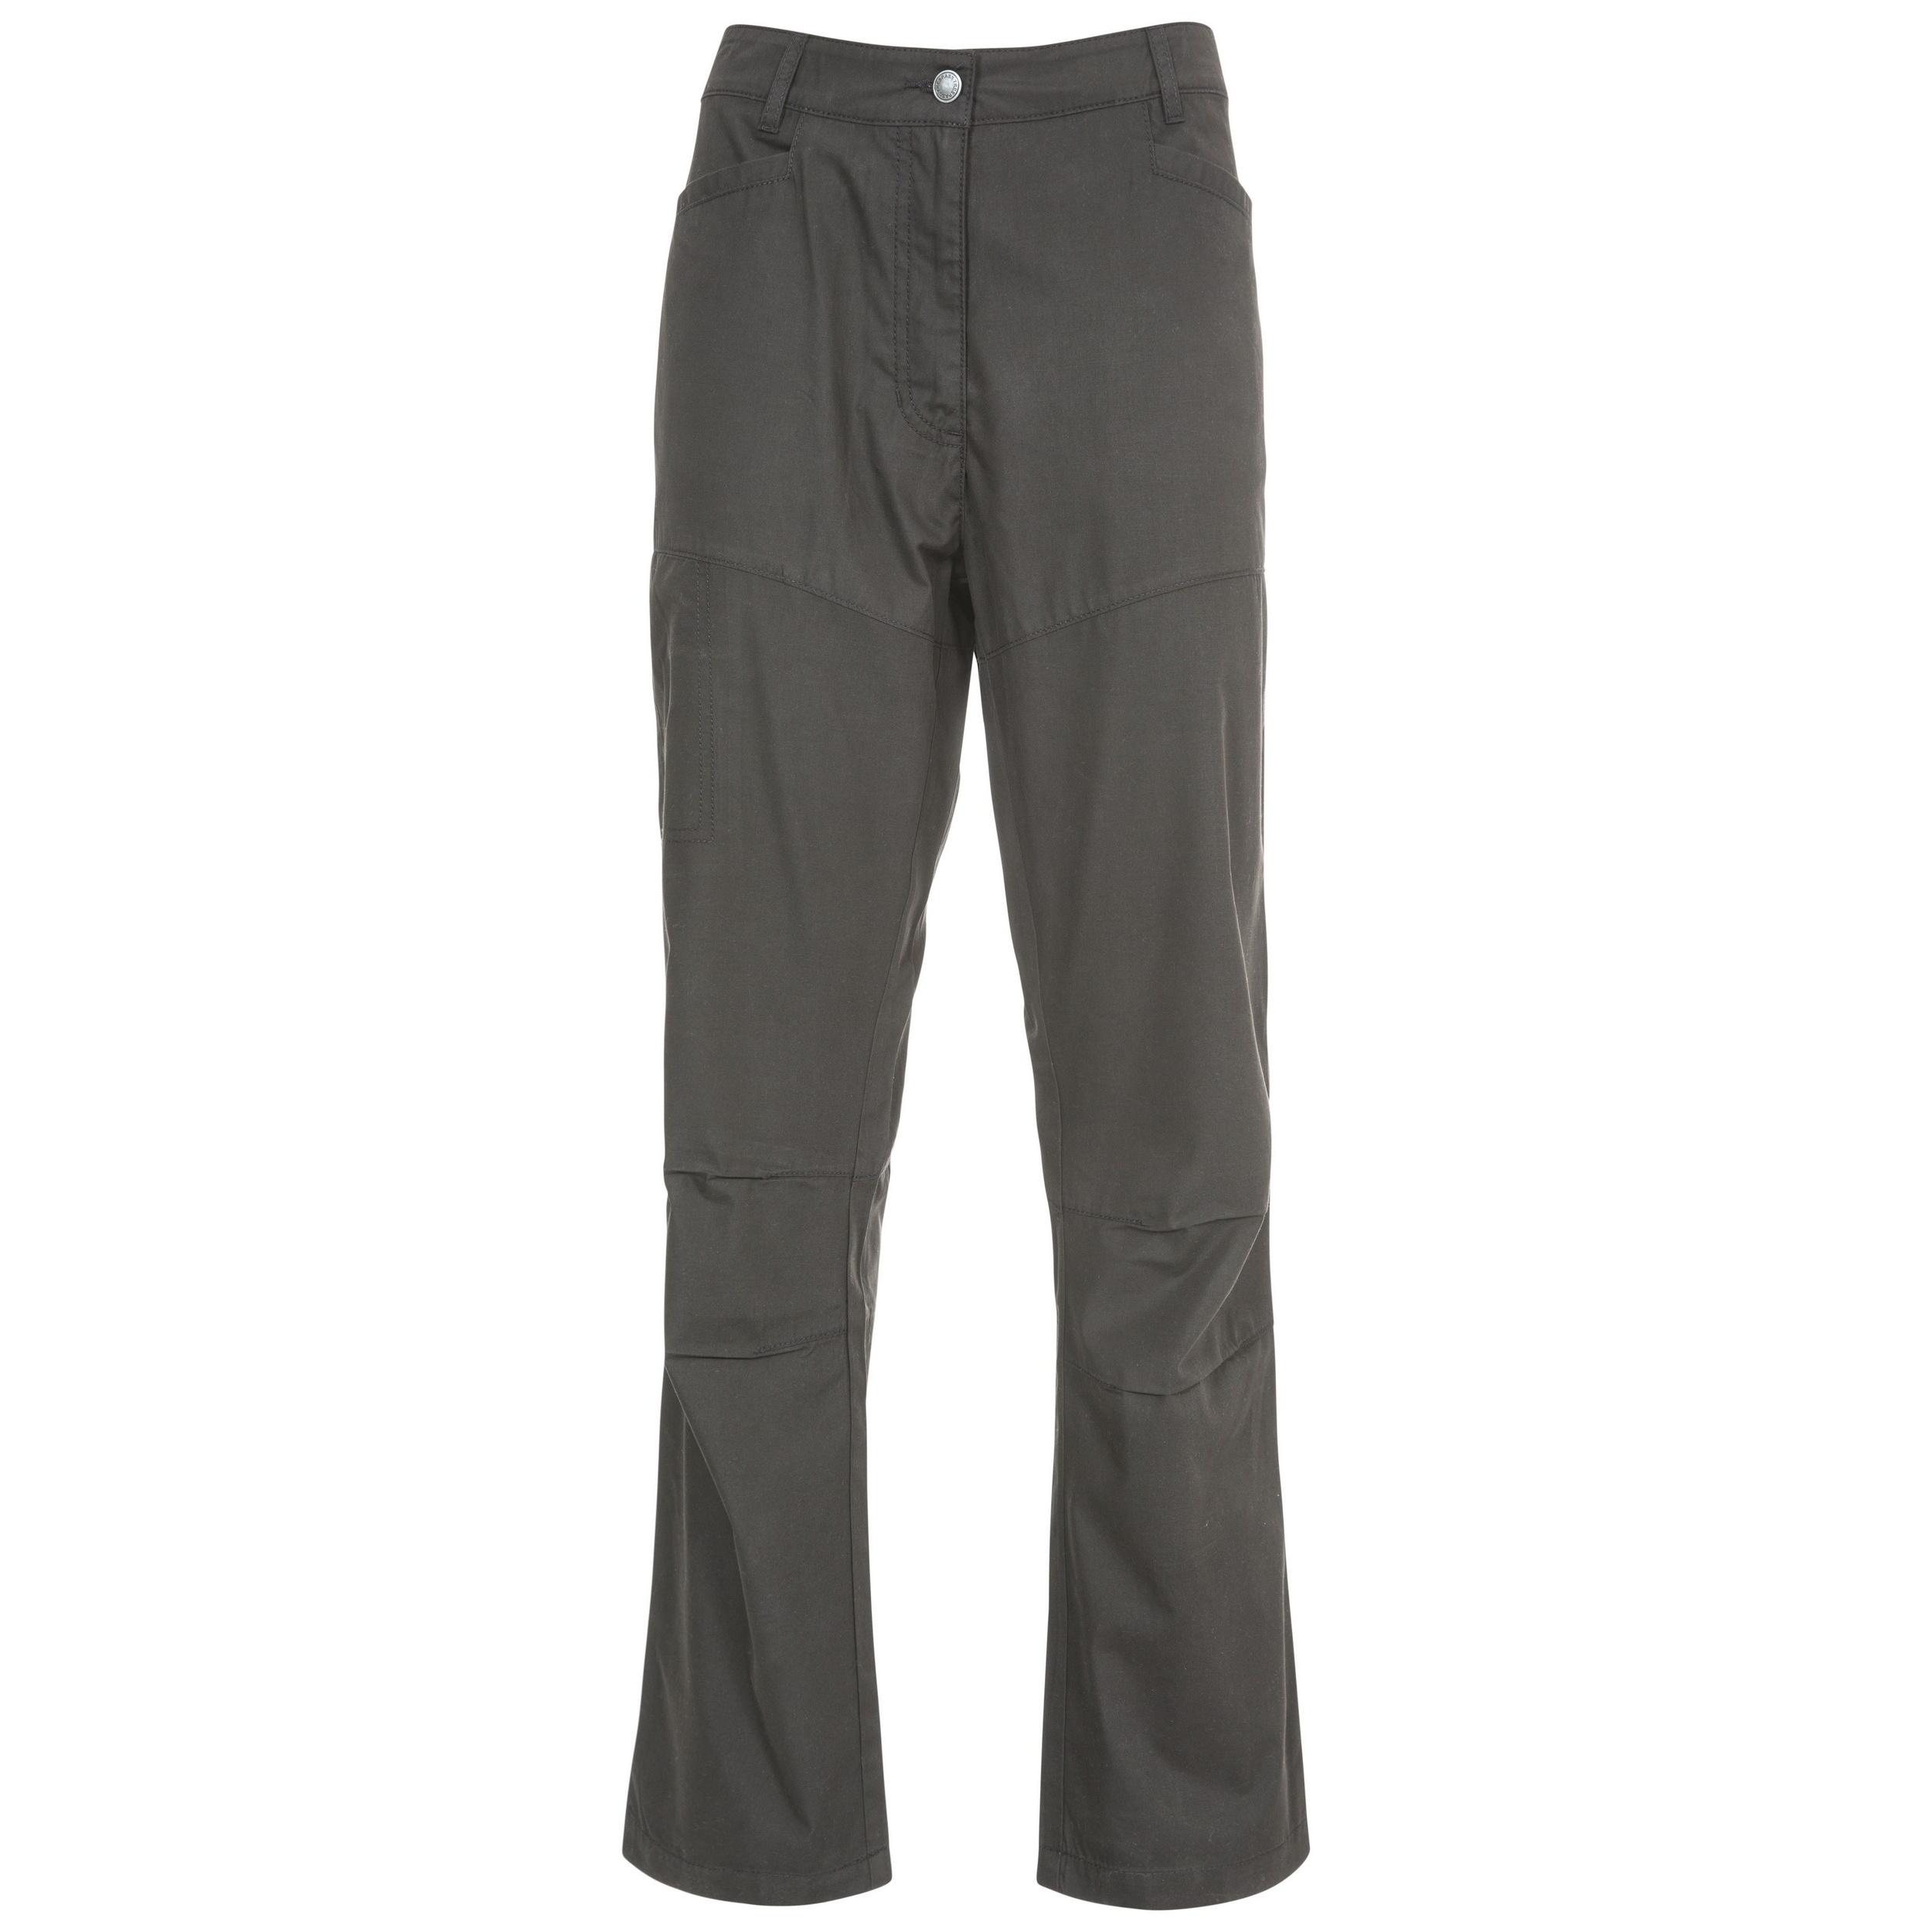 Trespass Womens//Ladies Terra Walking Trousers TP3667